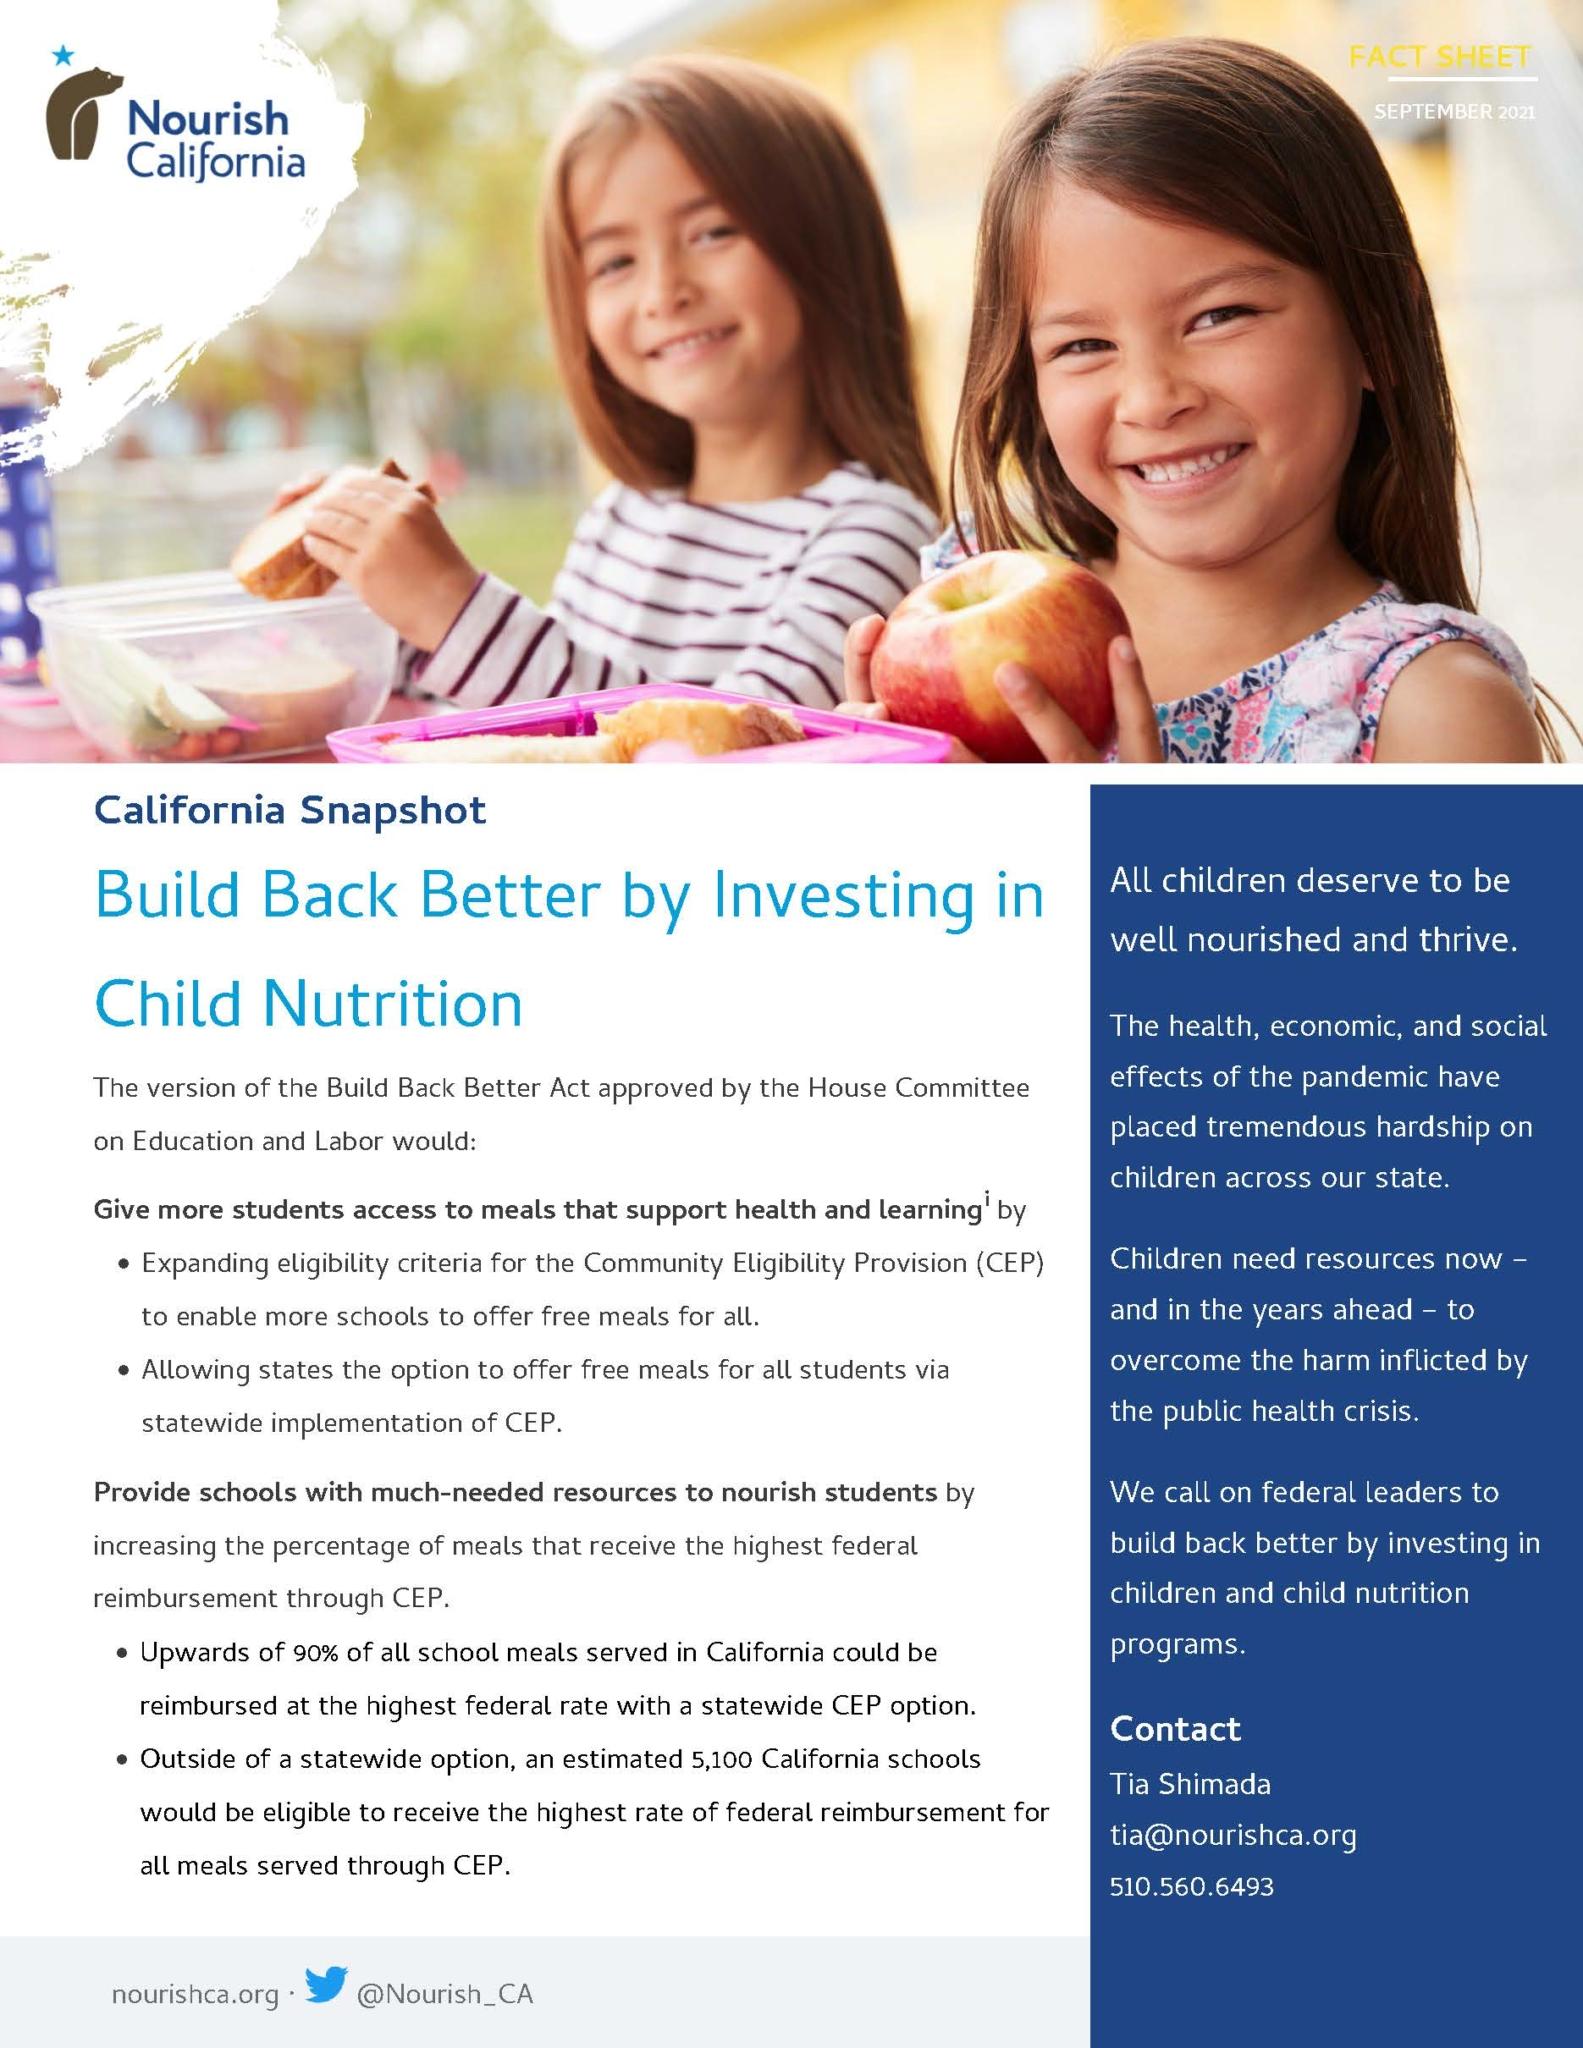 BuildBackBetter-ChildNutrition-CongressionalDistrict_9.27.2021_Page_1